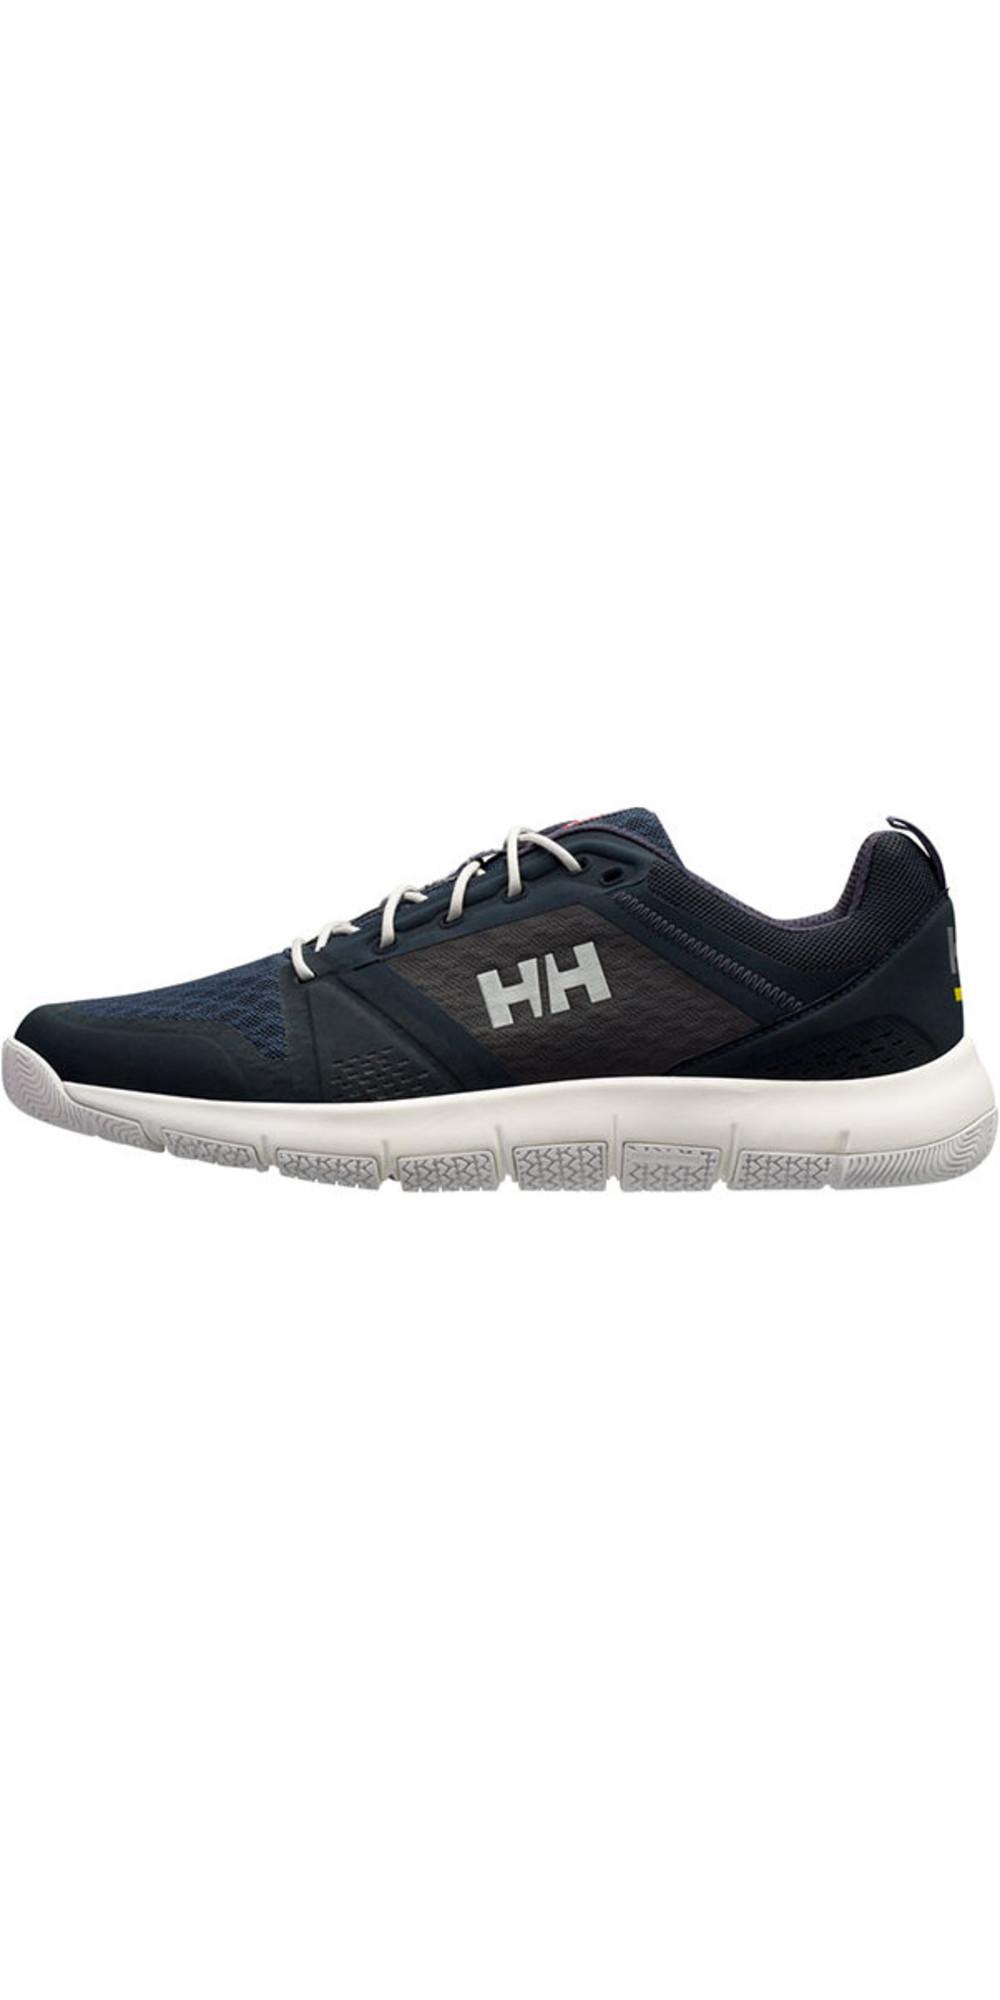 Helly Hansen Mens Shoe Skagen F-1